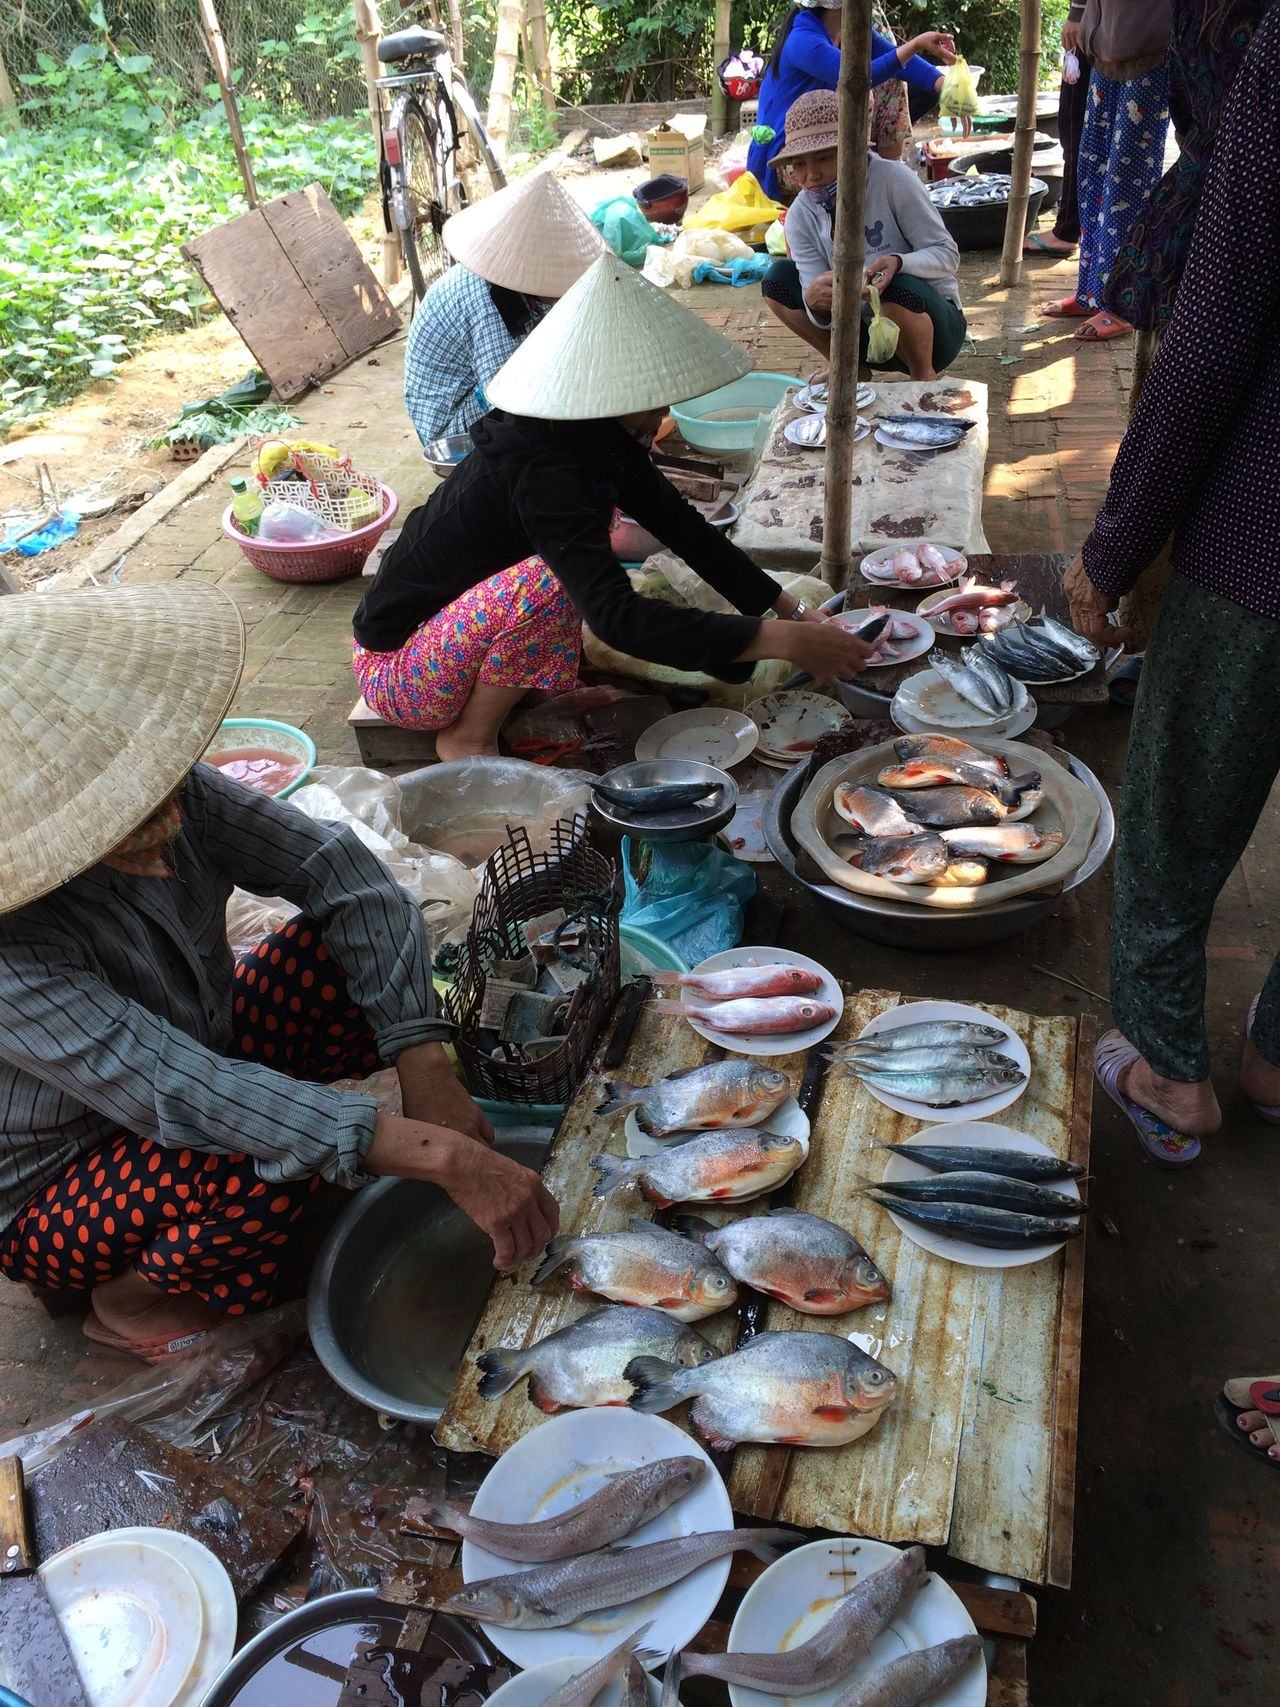 Fish Market Hoi An Vietnam The Photojournalist - 2016 EyeEm Awards